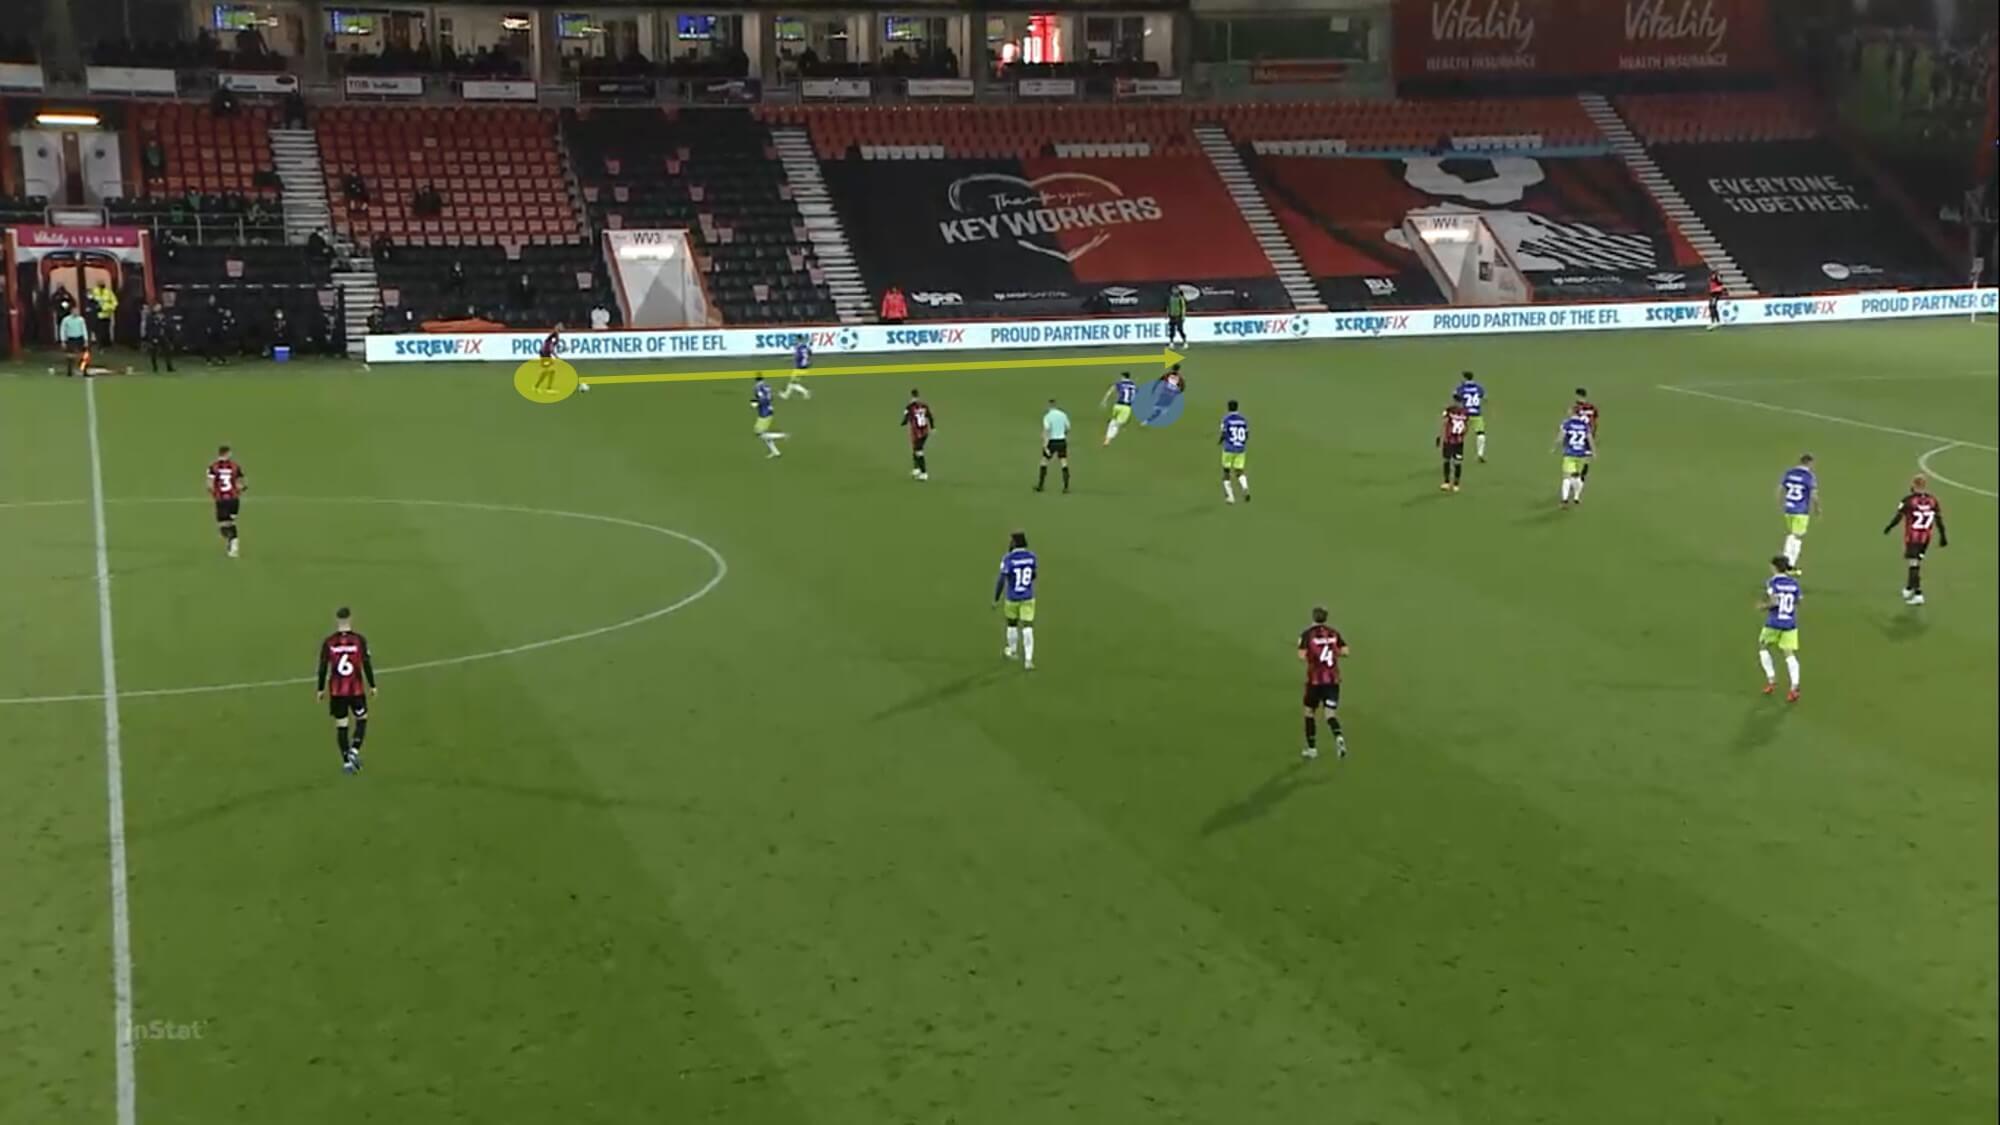 EFL Championship 2020/21: Bournemouth vs Bristol City - tactical analysis - tactics